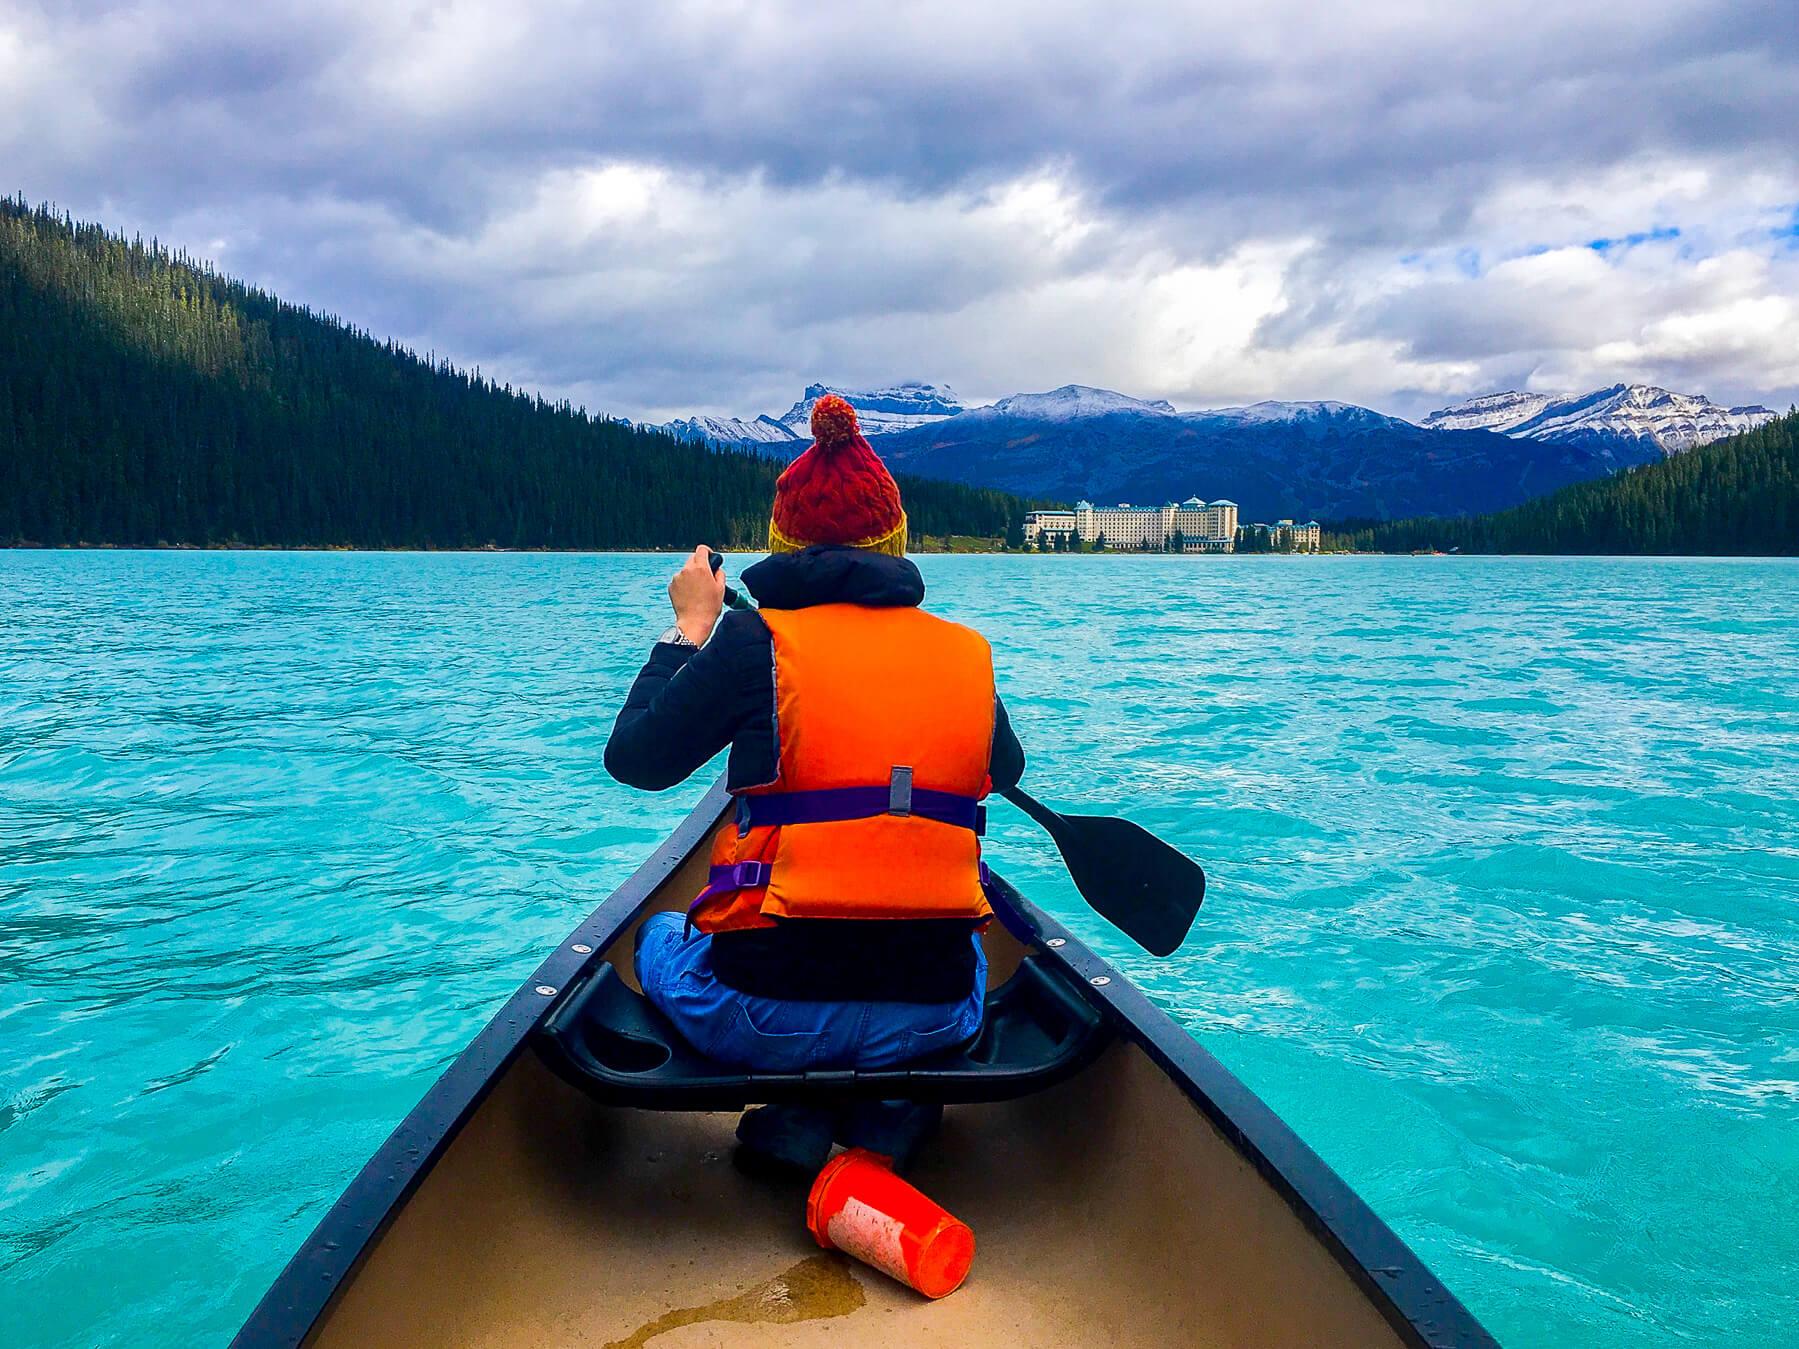 Girl canoeing on Lake Louise - Turquoise water